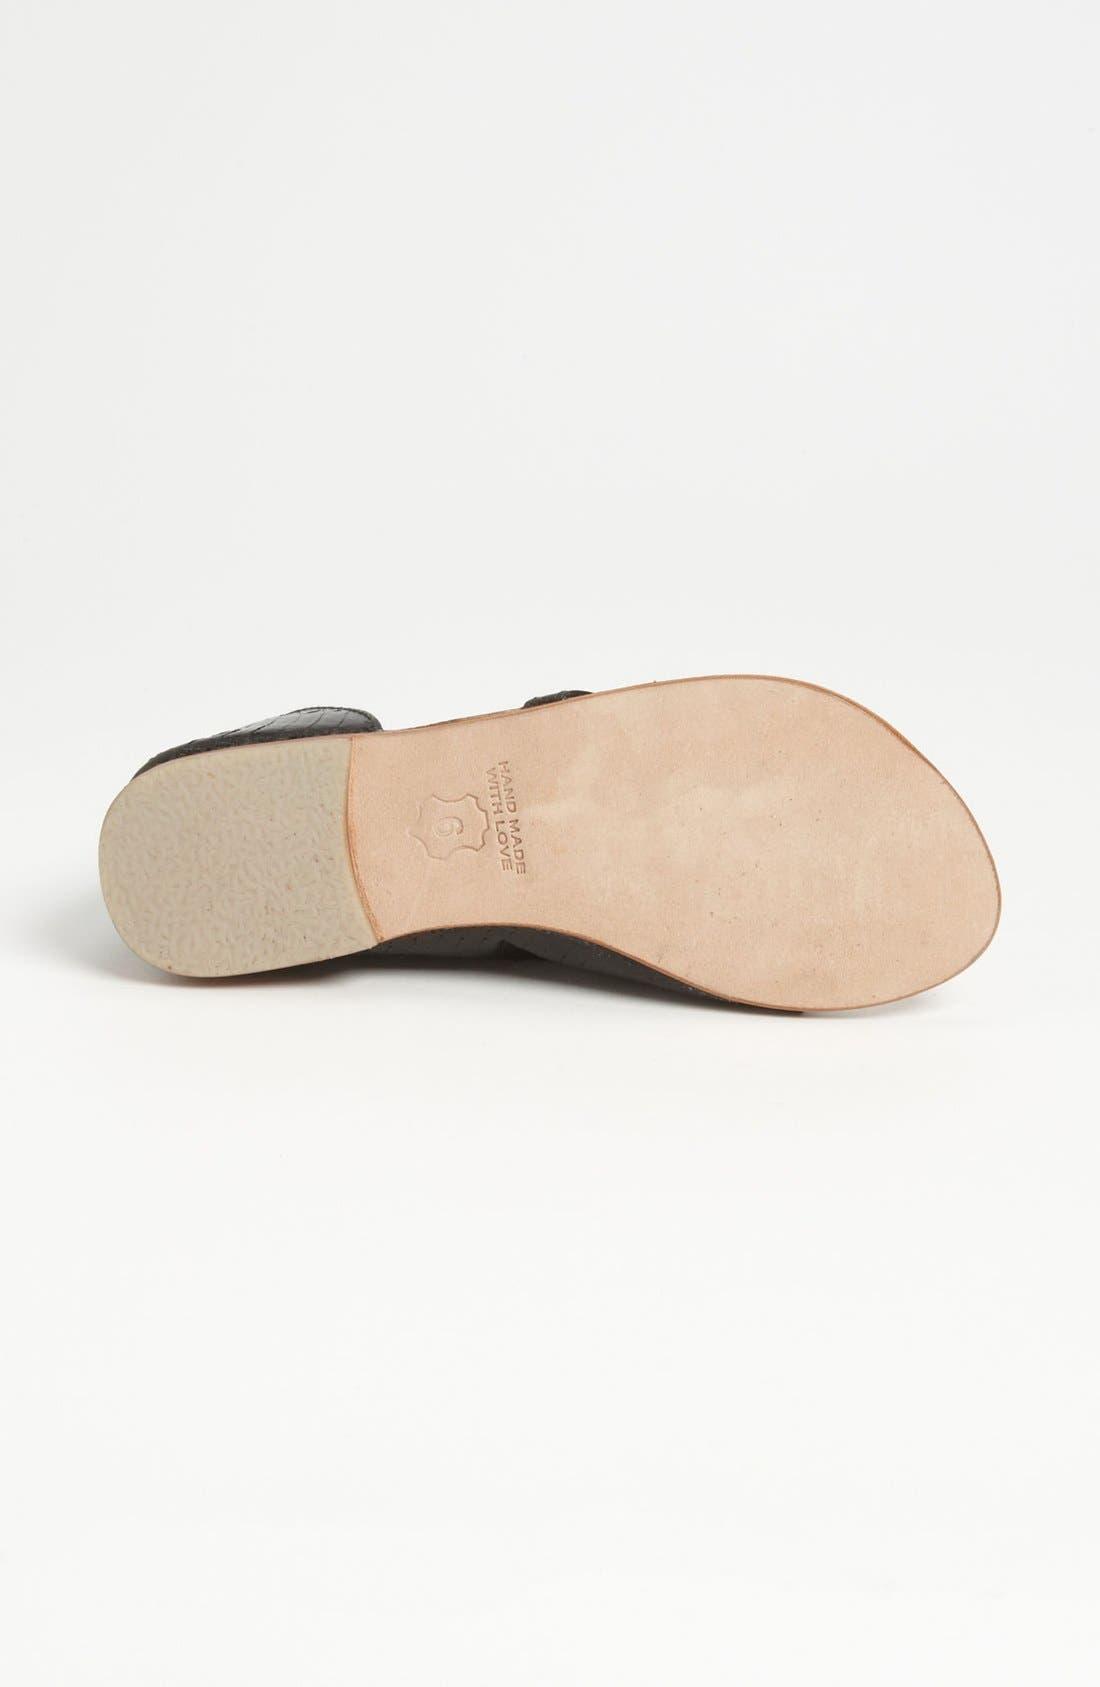 Ankle Wrap Sandal,                             Alternate thumbnail 3, color,                             001